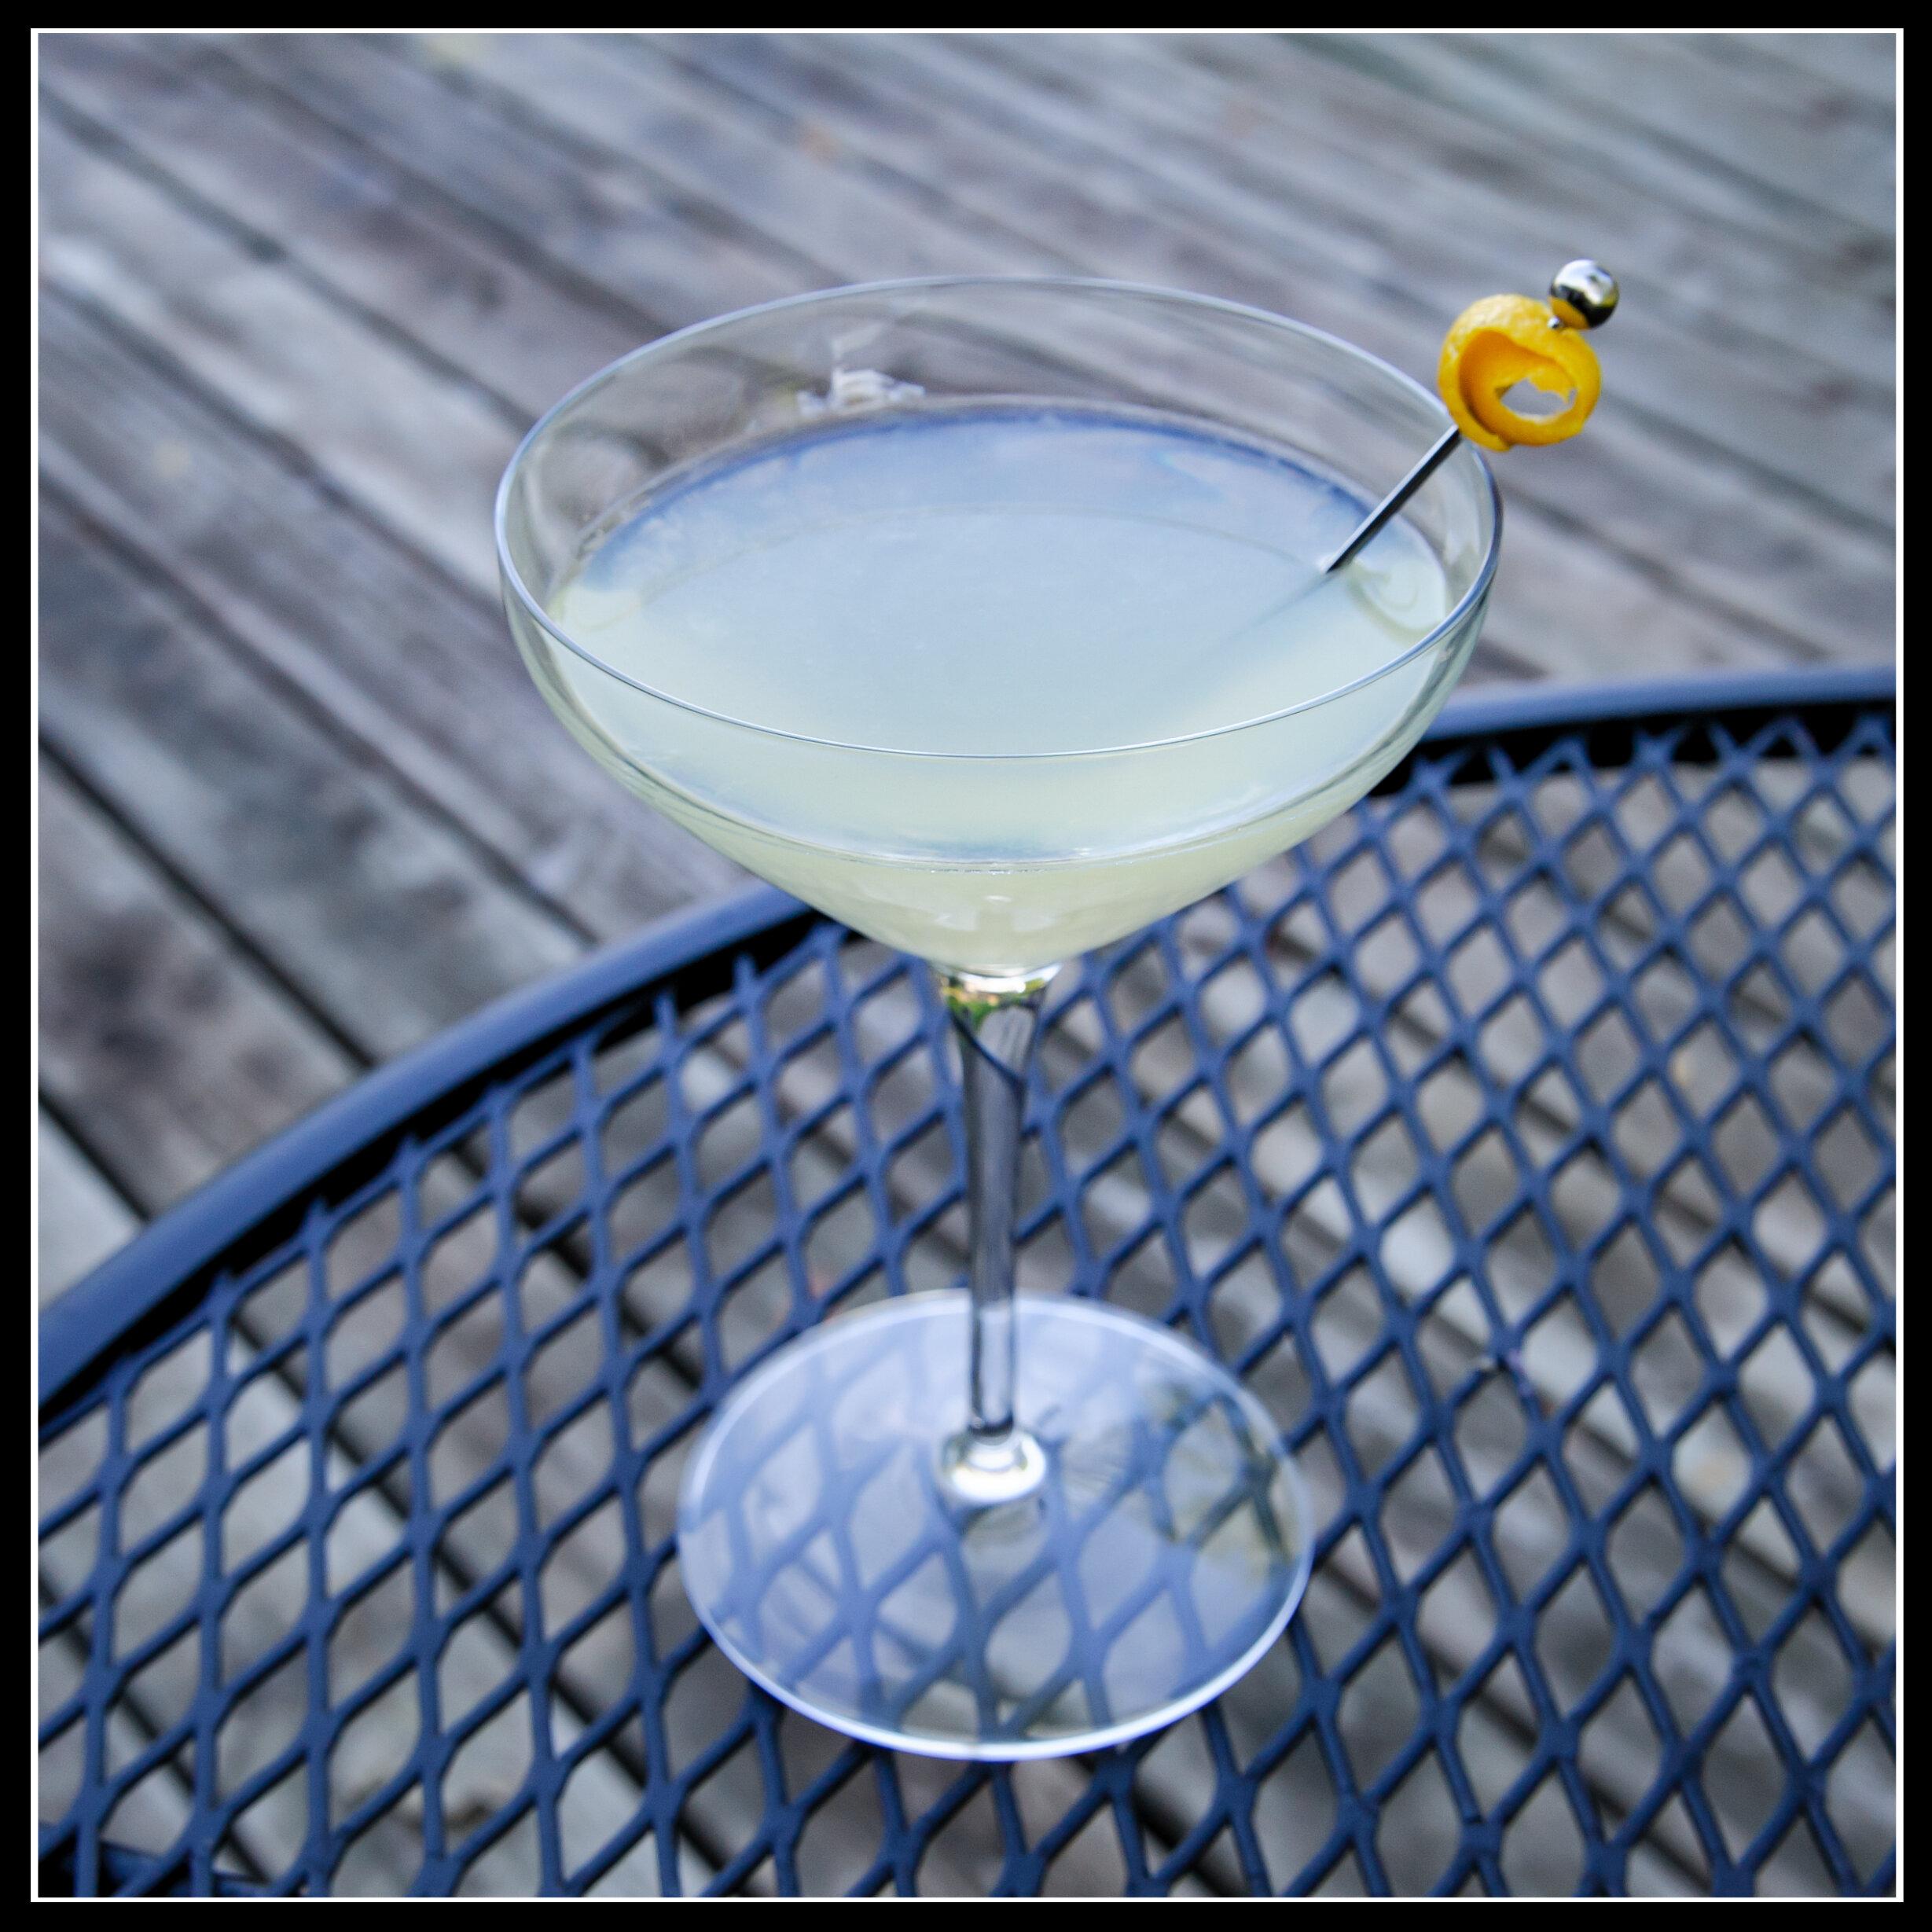 limoncello gin martini - 1.5 Stony Point Gin 1.5 Limoncello0.5 fresh lemon juice0.5 simple syrupShake on iceMartini glass, garnish with lemon peel